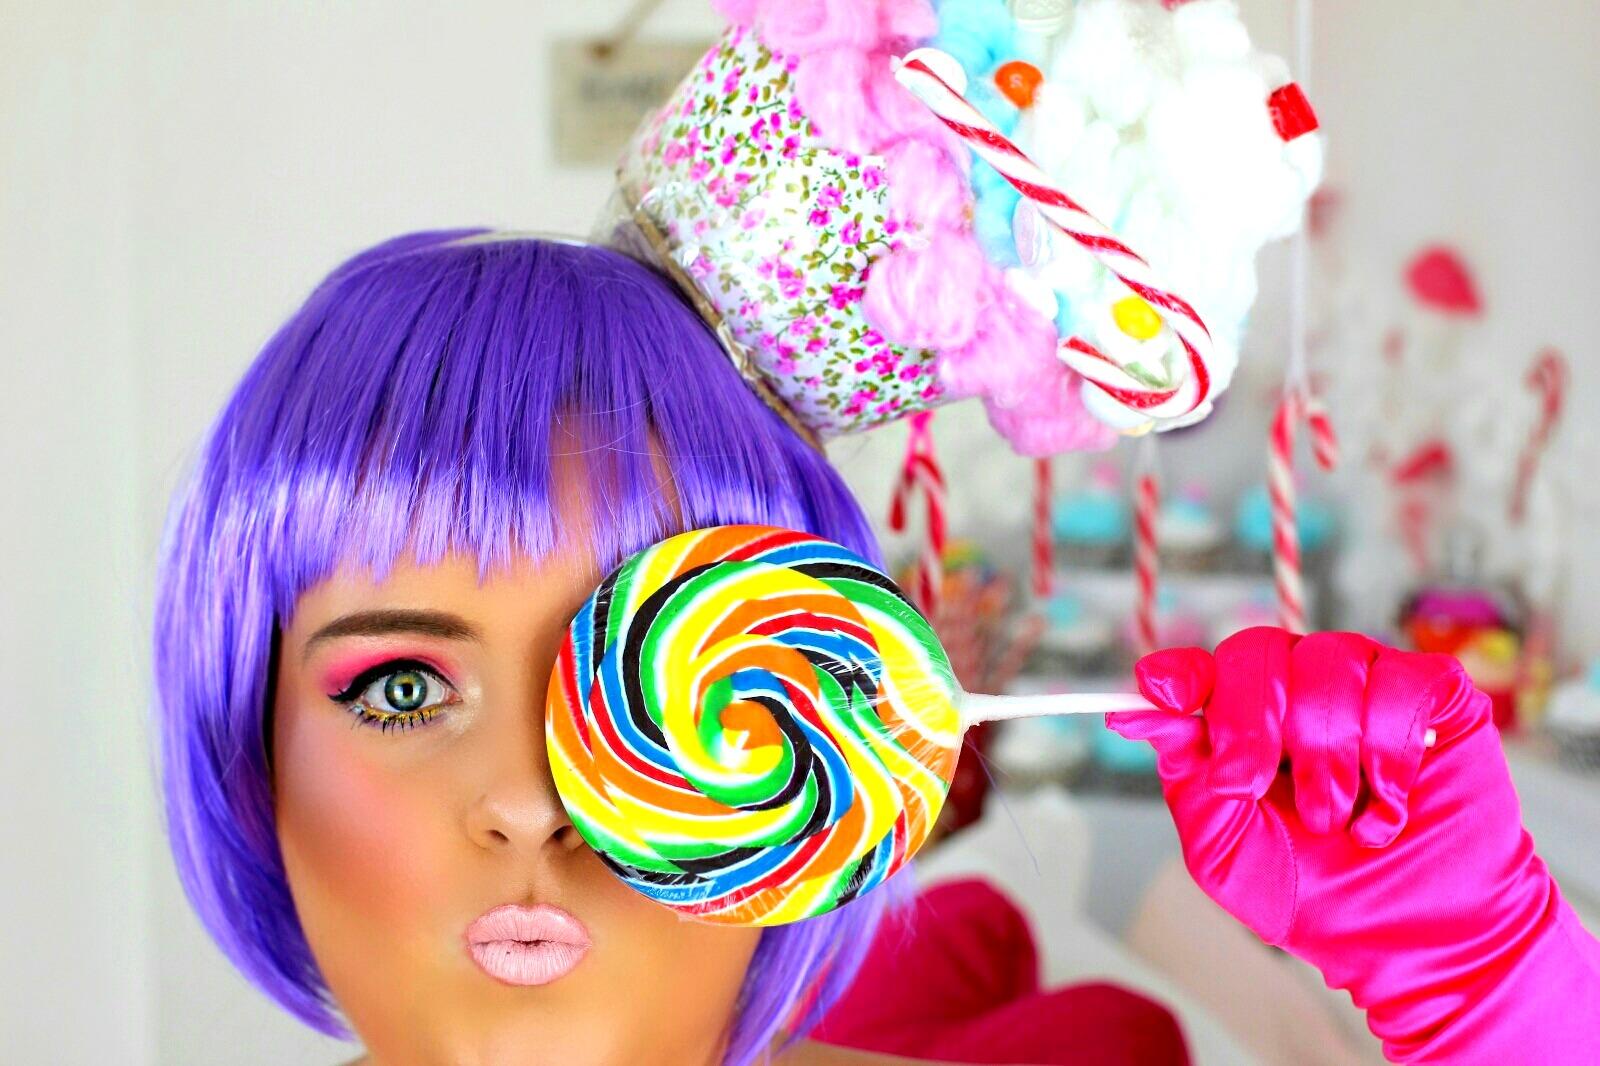 Candy Girl Halloween Makeup Jodie Caughey - Sweet Halloween Makeup